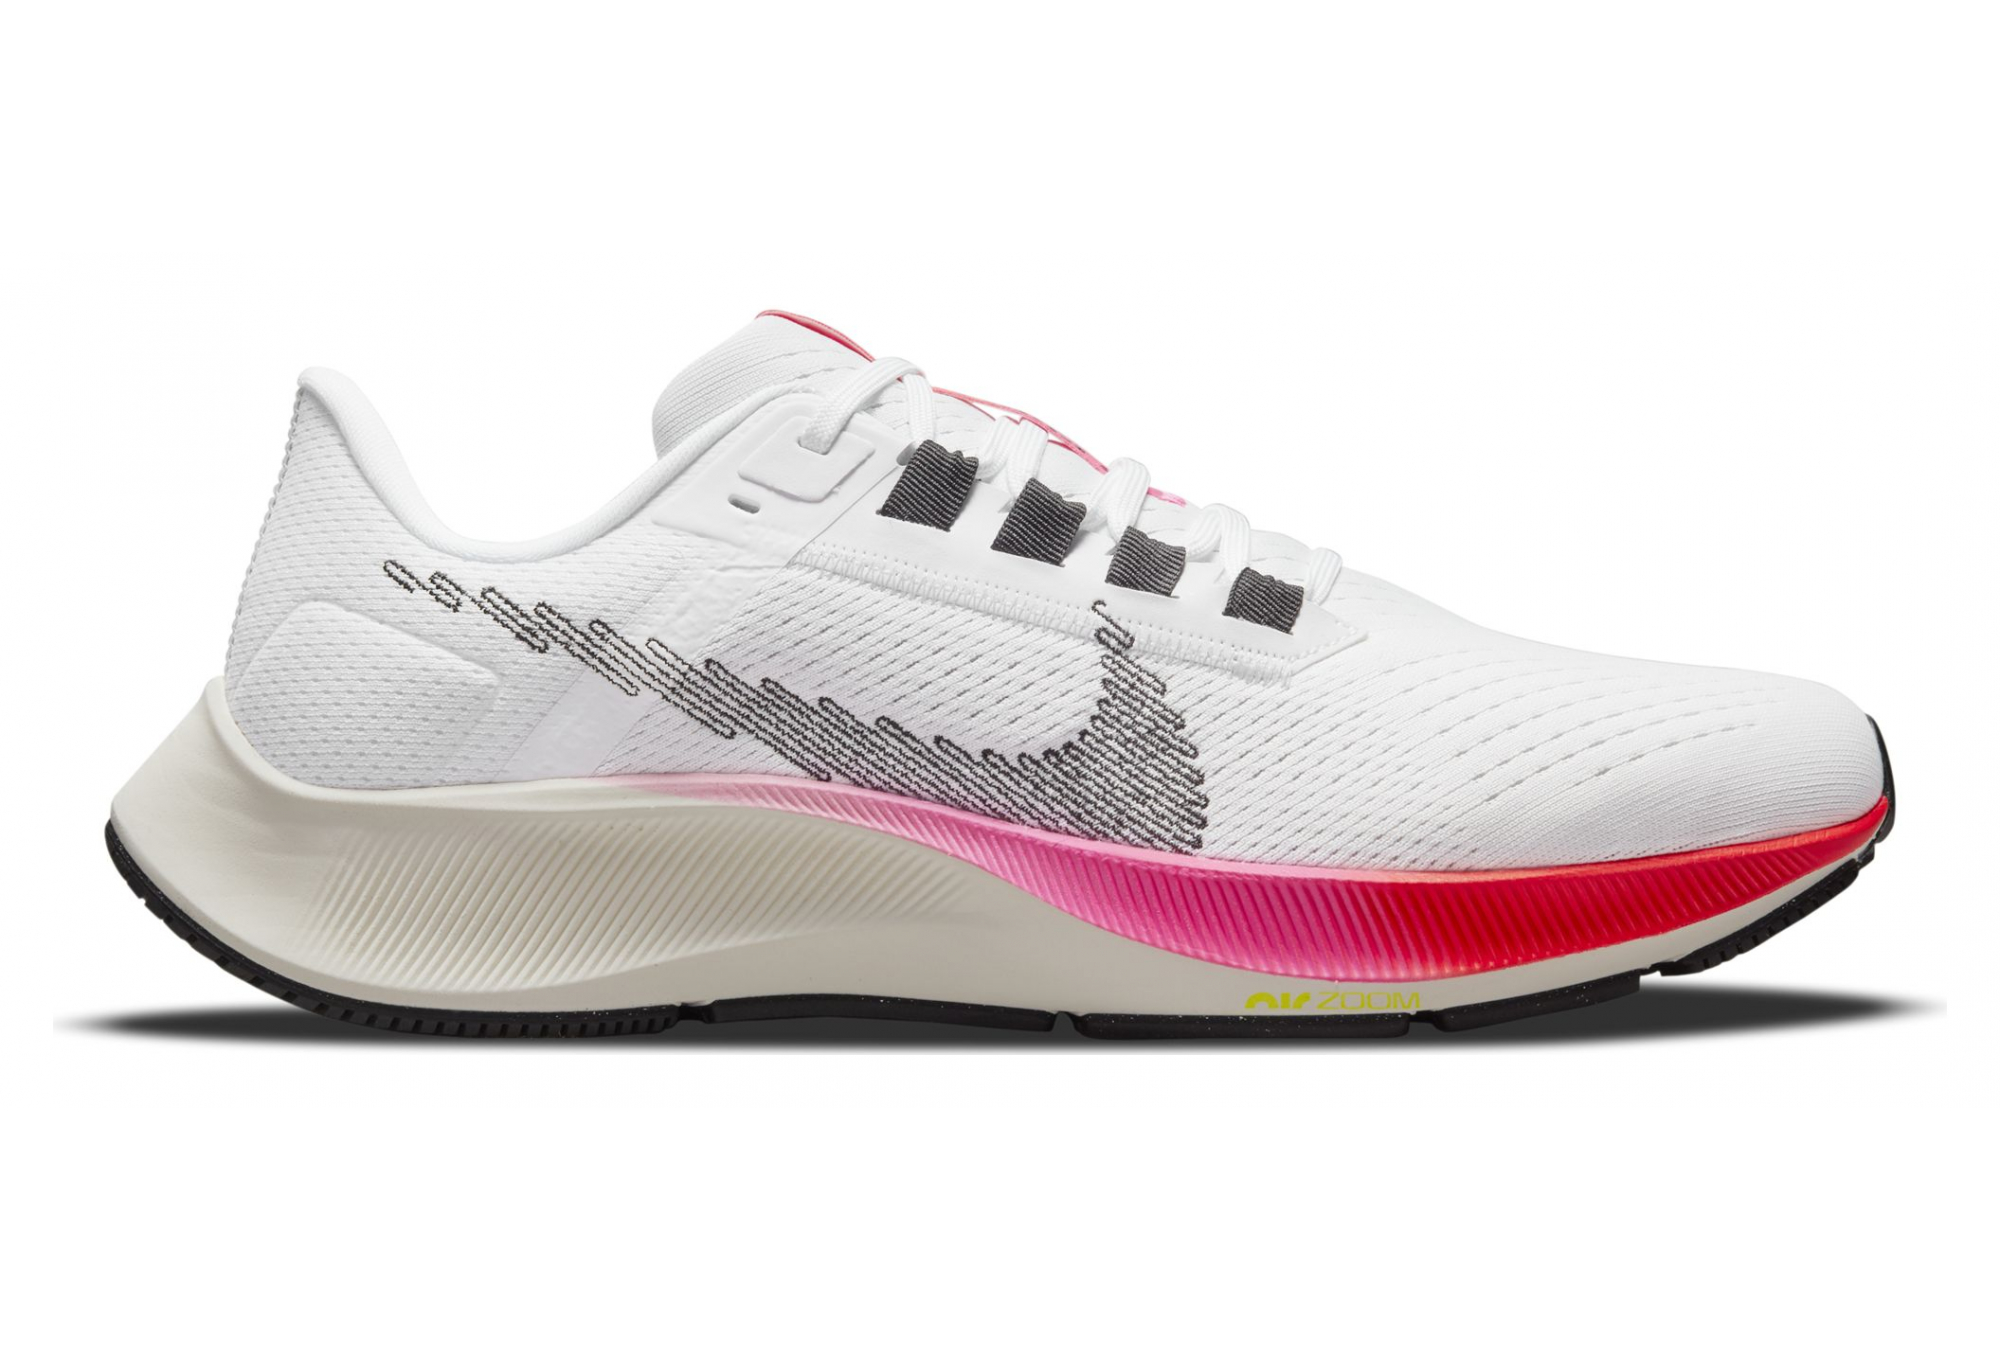 Chaussures de Running Nike Air Zoom Pegasus 38 Rawdacious Blanc / Rose